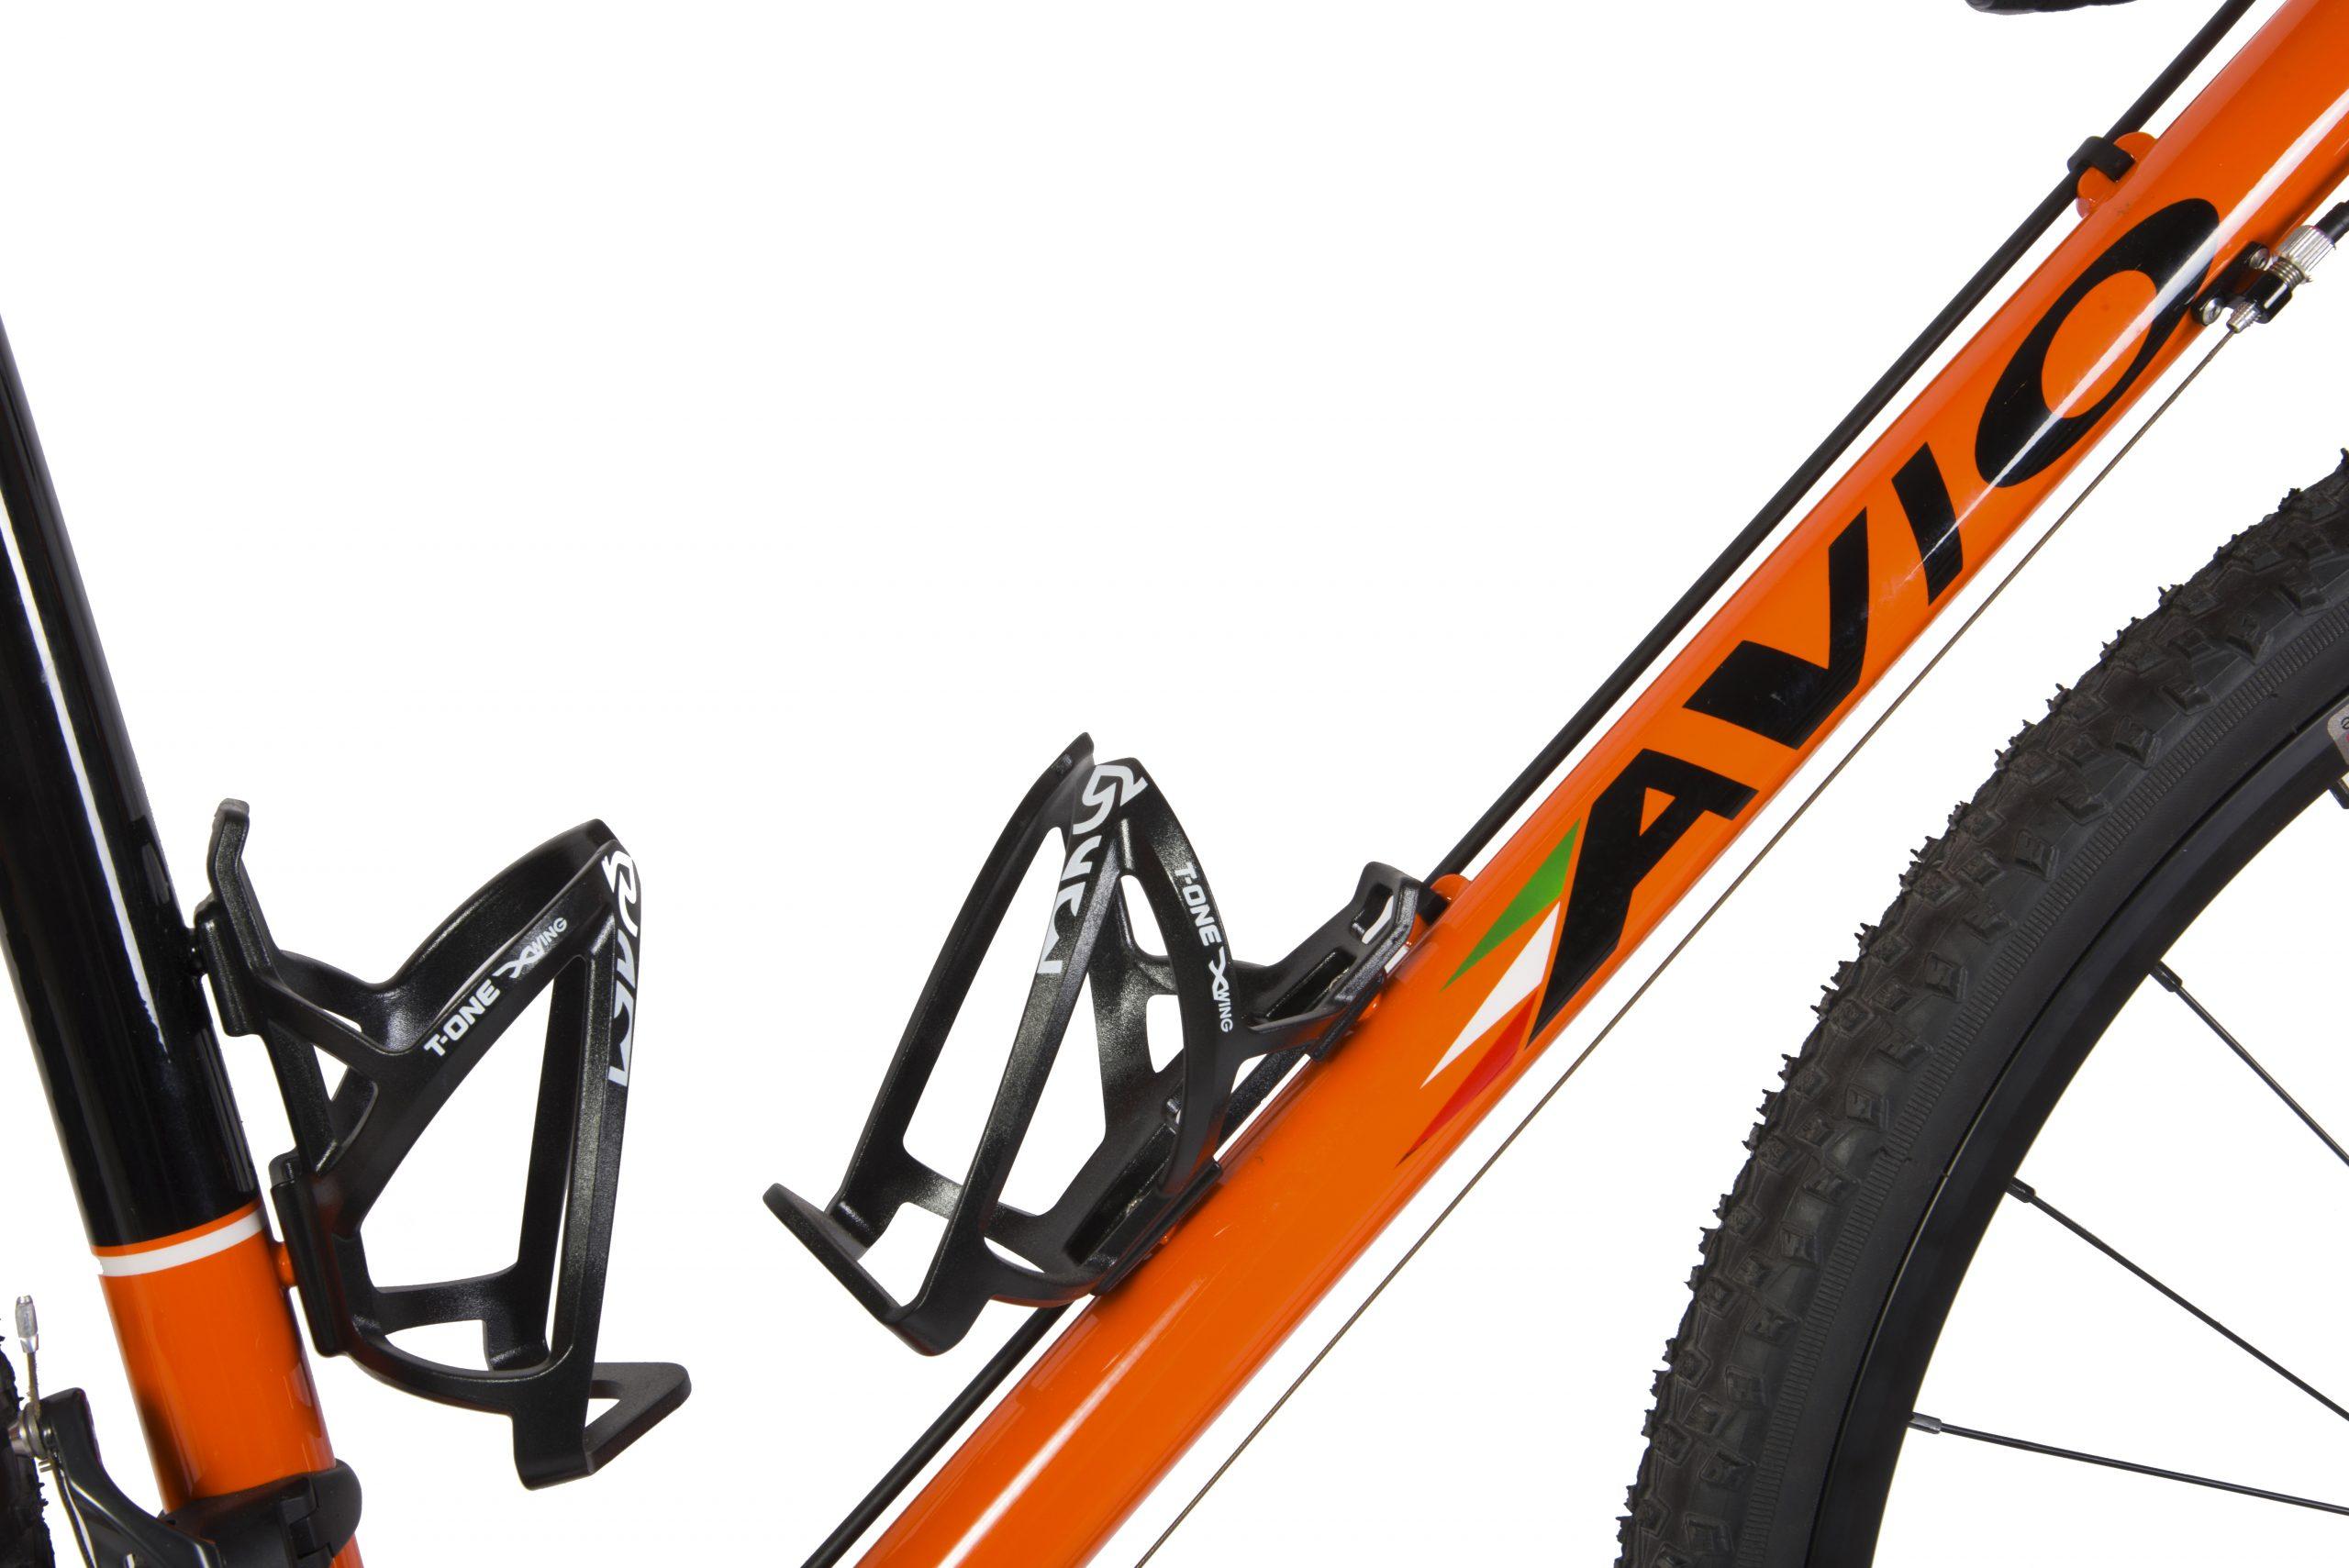 Aviobike Angelo Allevi bicicletta muscolare King Air Gravel